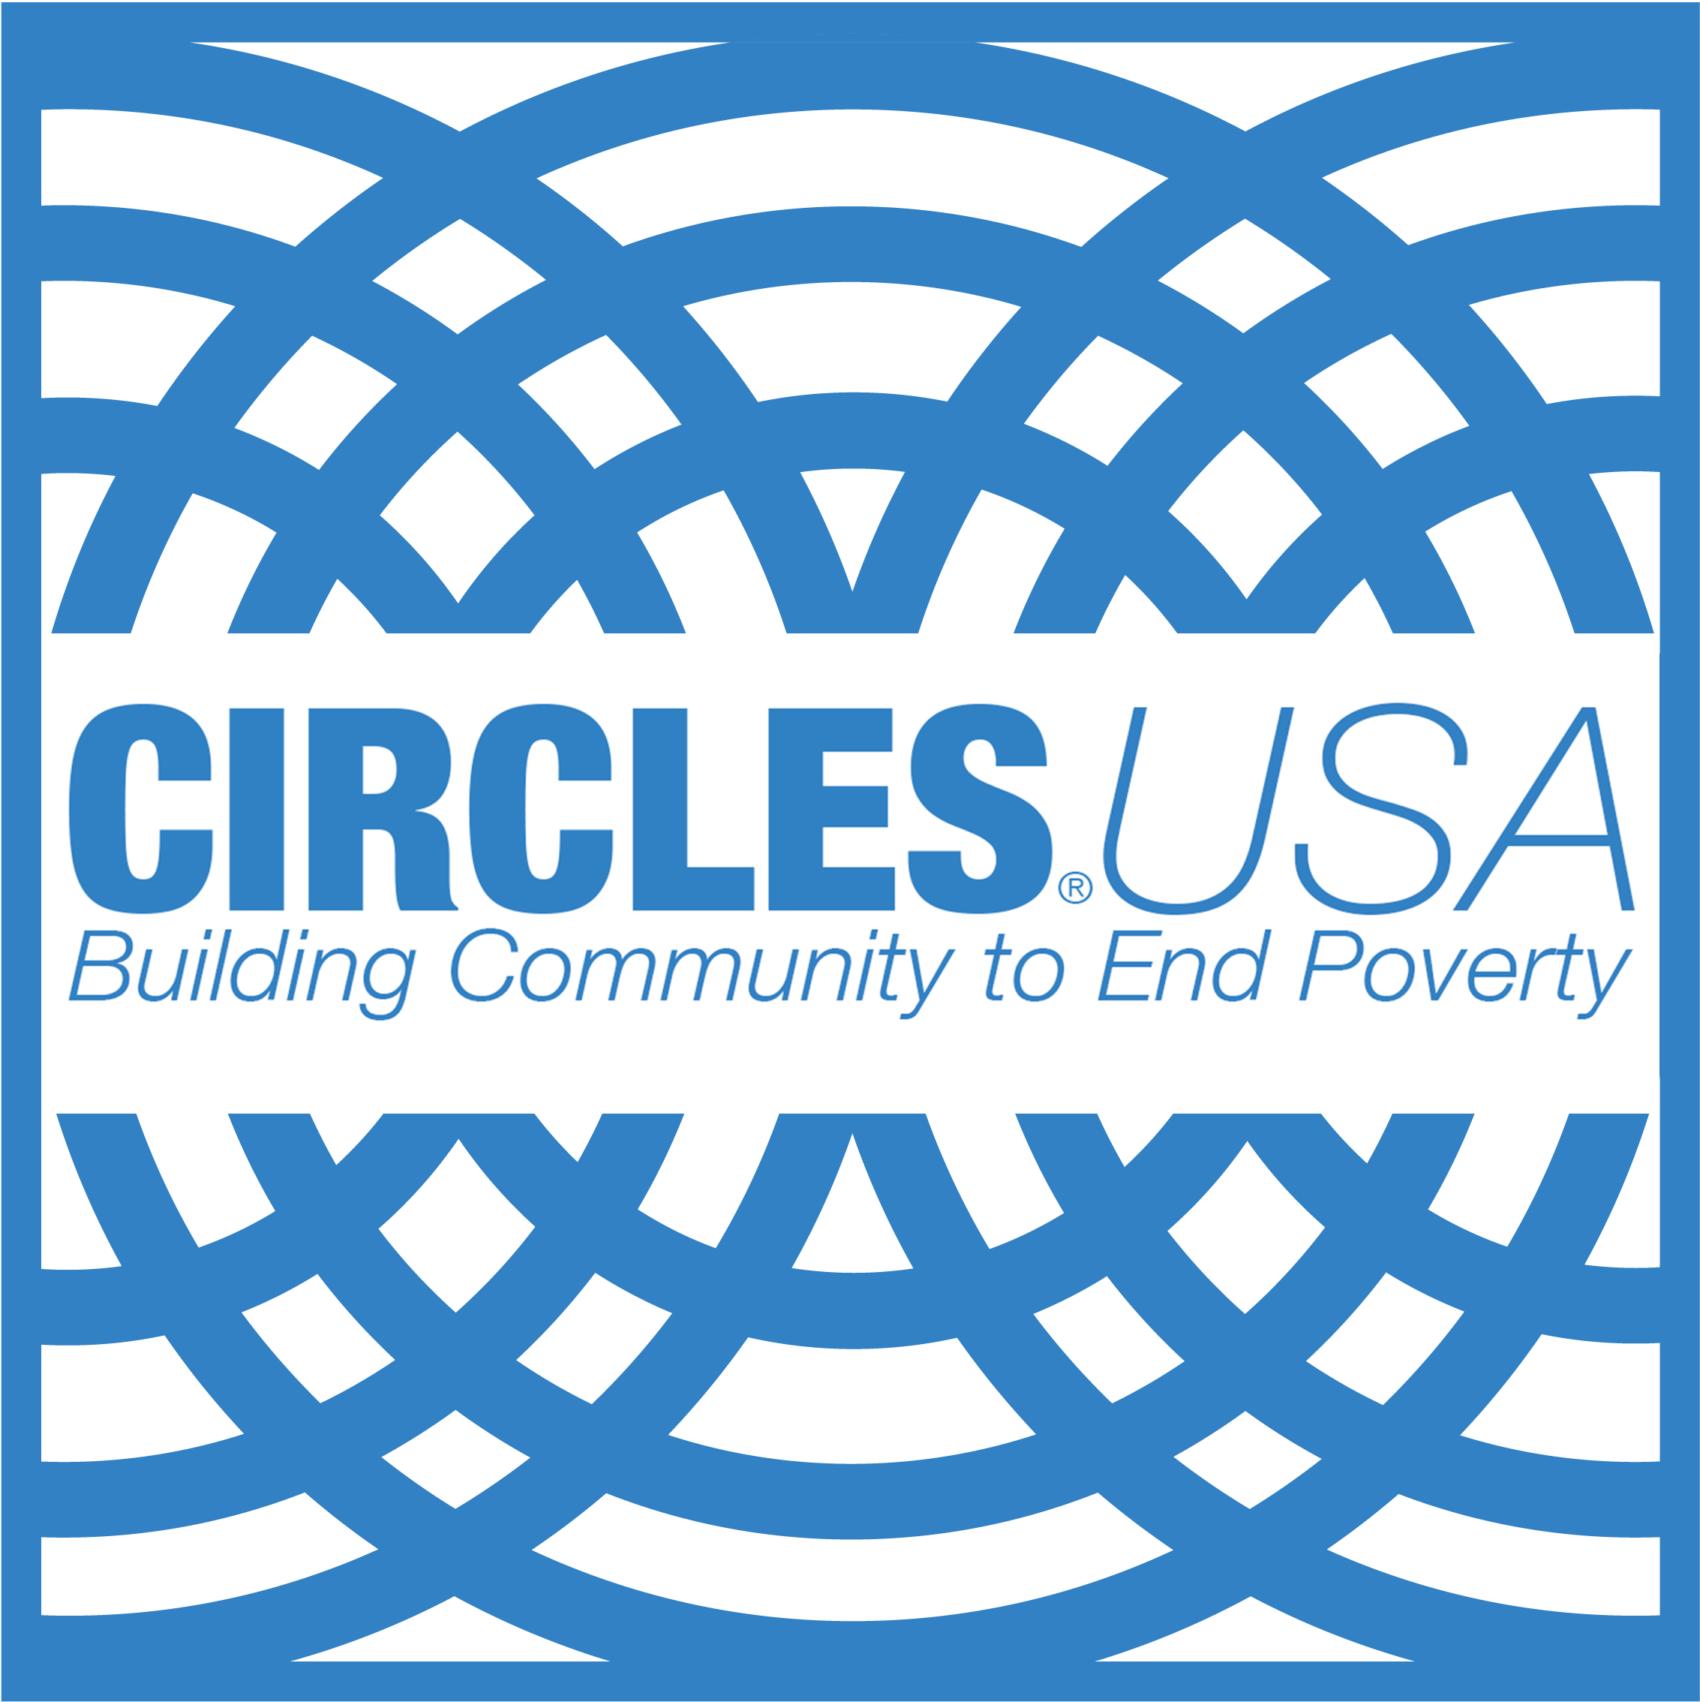 square-png-transparent-circles-logo-e1546983447725.png